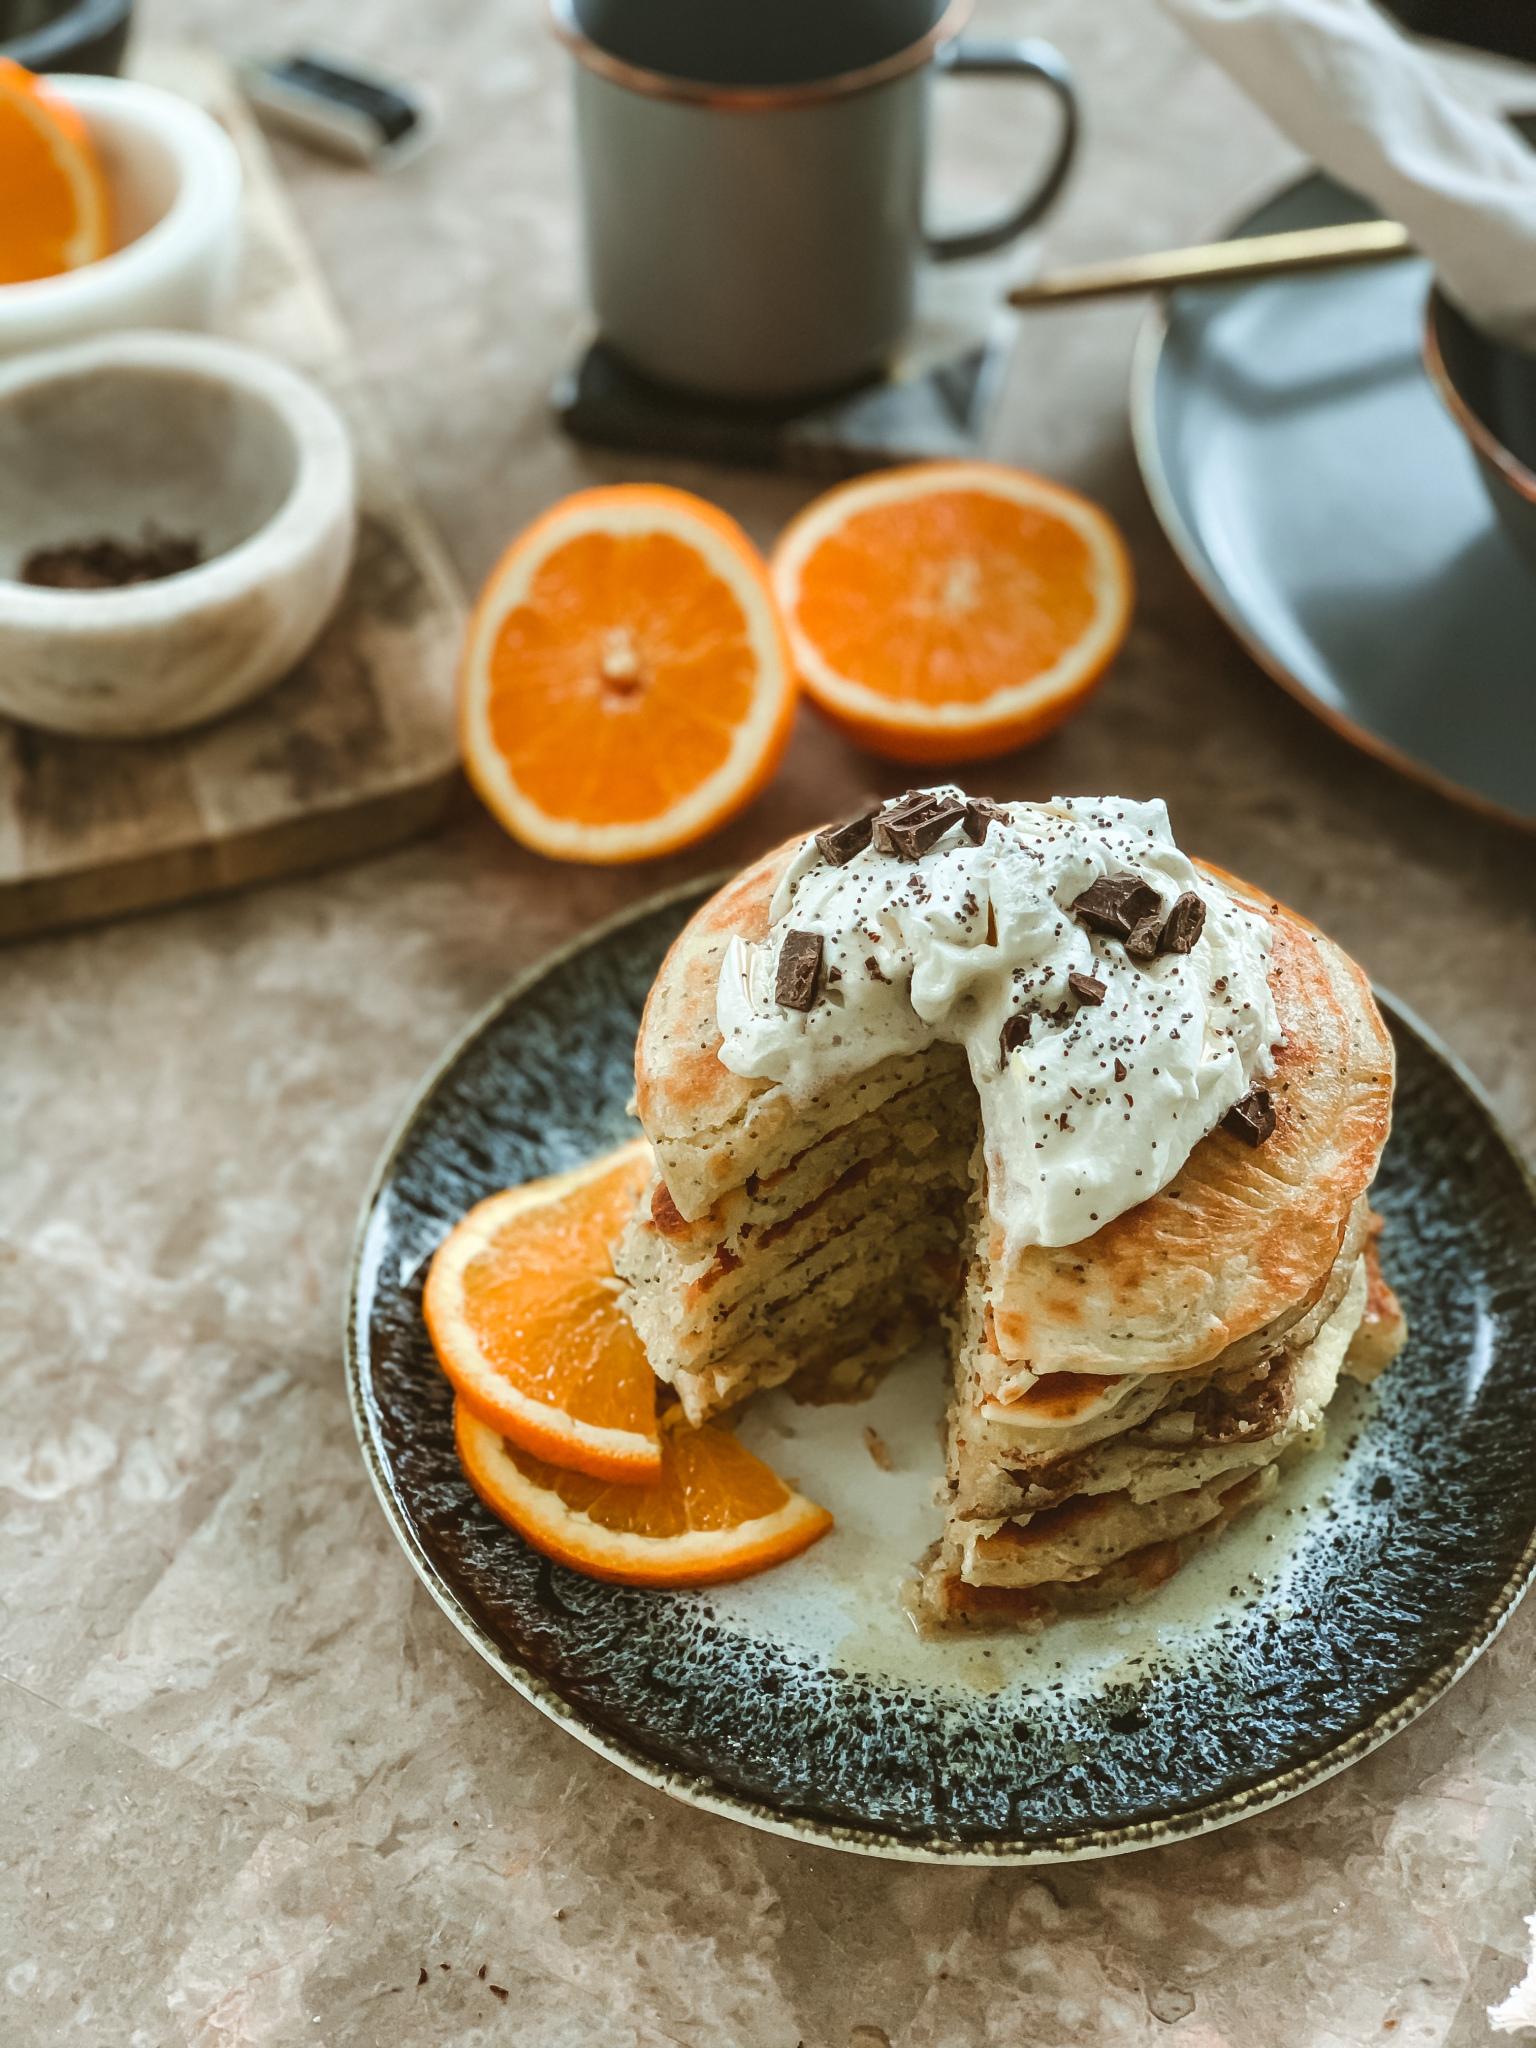 Poppyseed Pancakes by Runamok Maple